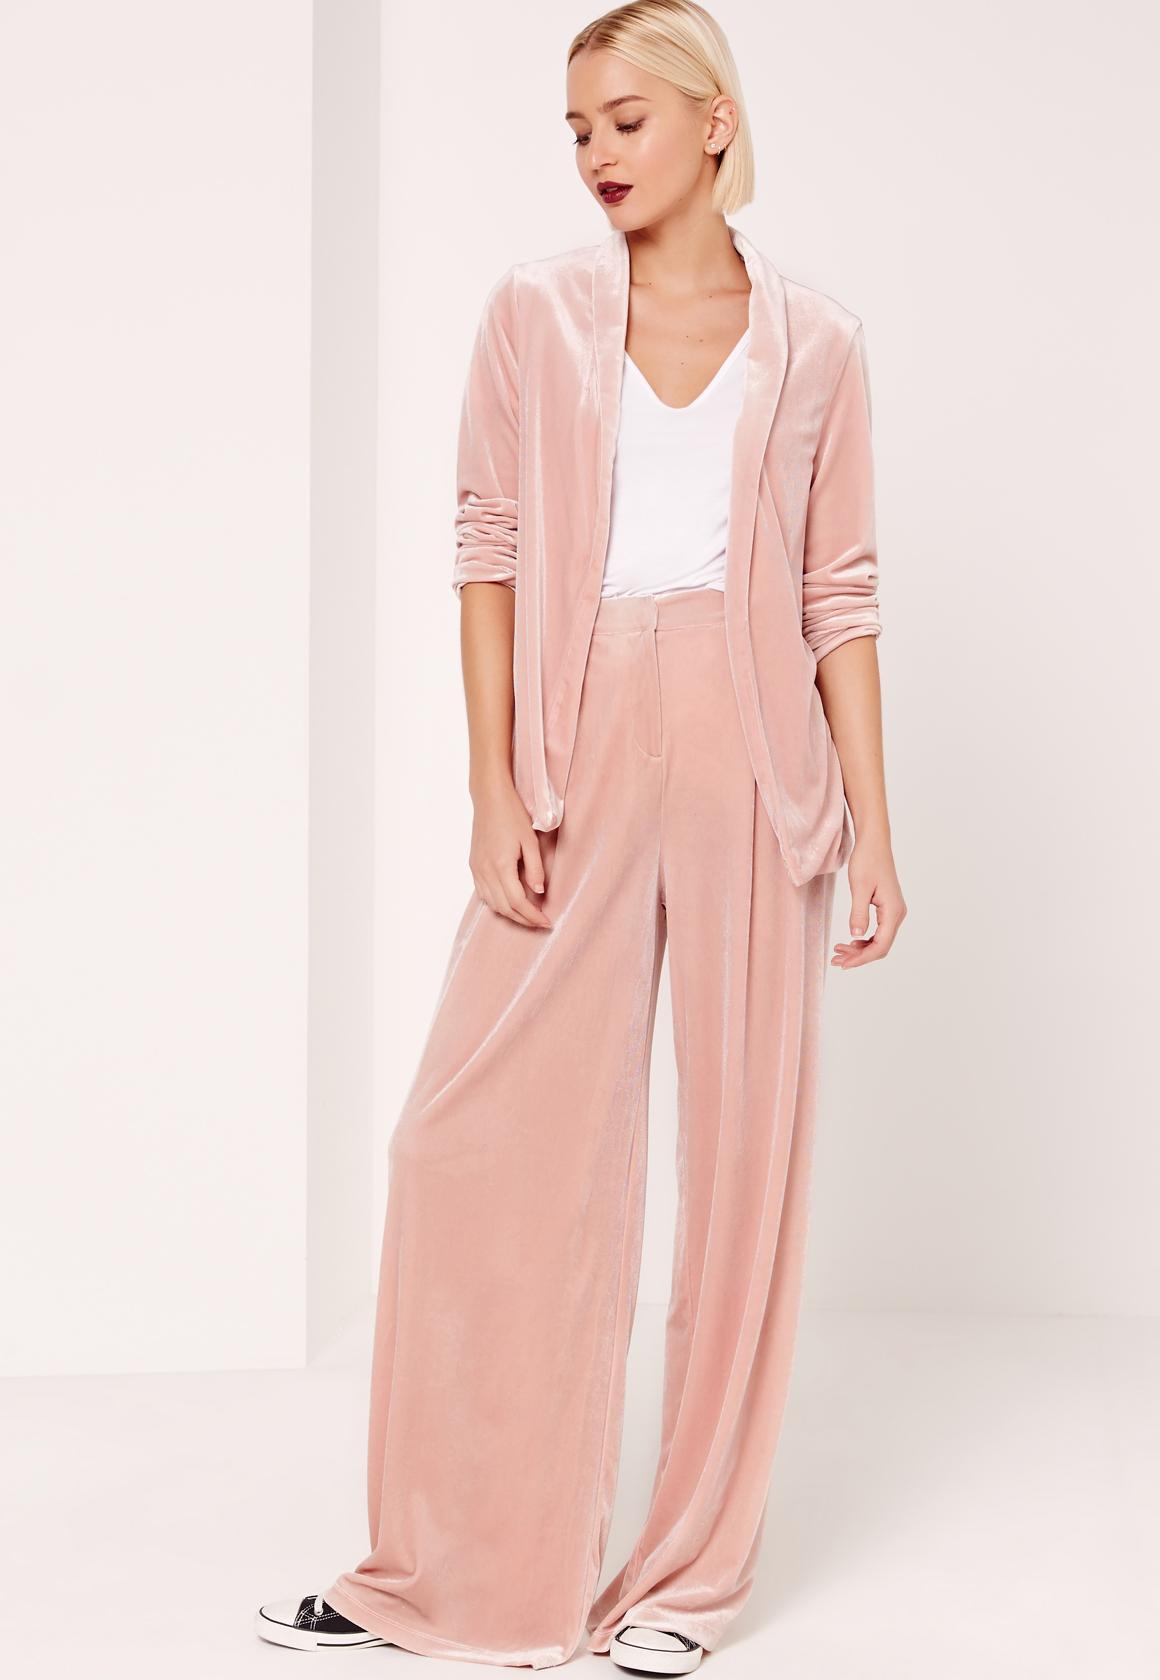 how-to-style-pink-light-wideleg-pants-black-shoe-sneakers-white-tee-pink-light-jacket-blazer-suit-blonde-bob-fall-winter-fashion-velvet-dinner.jpg